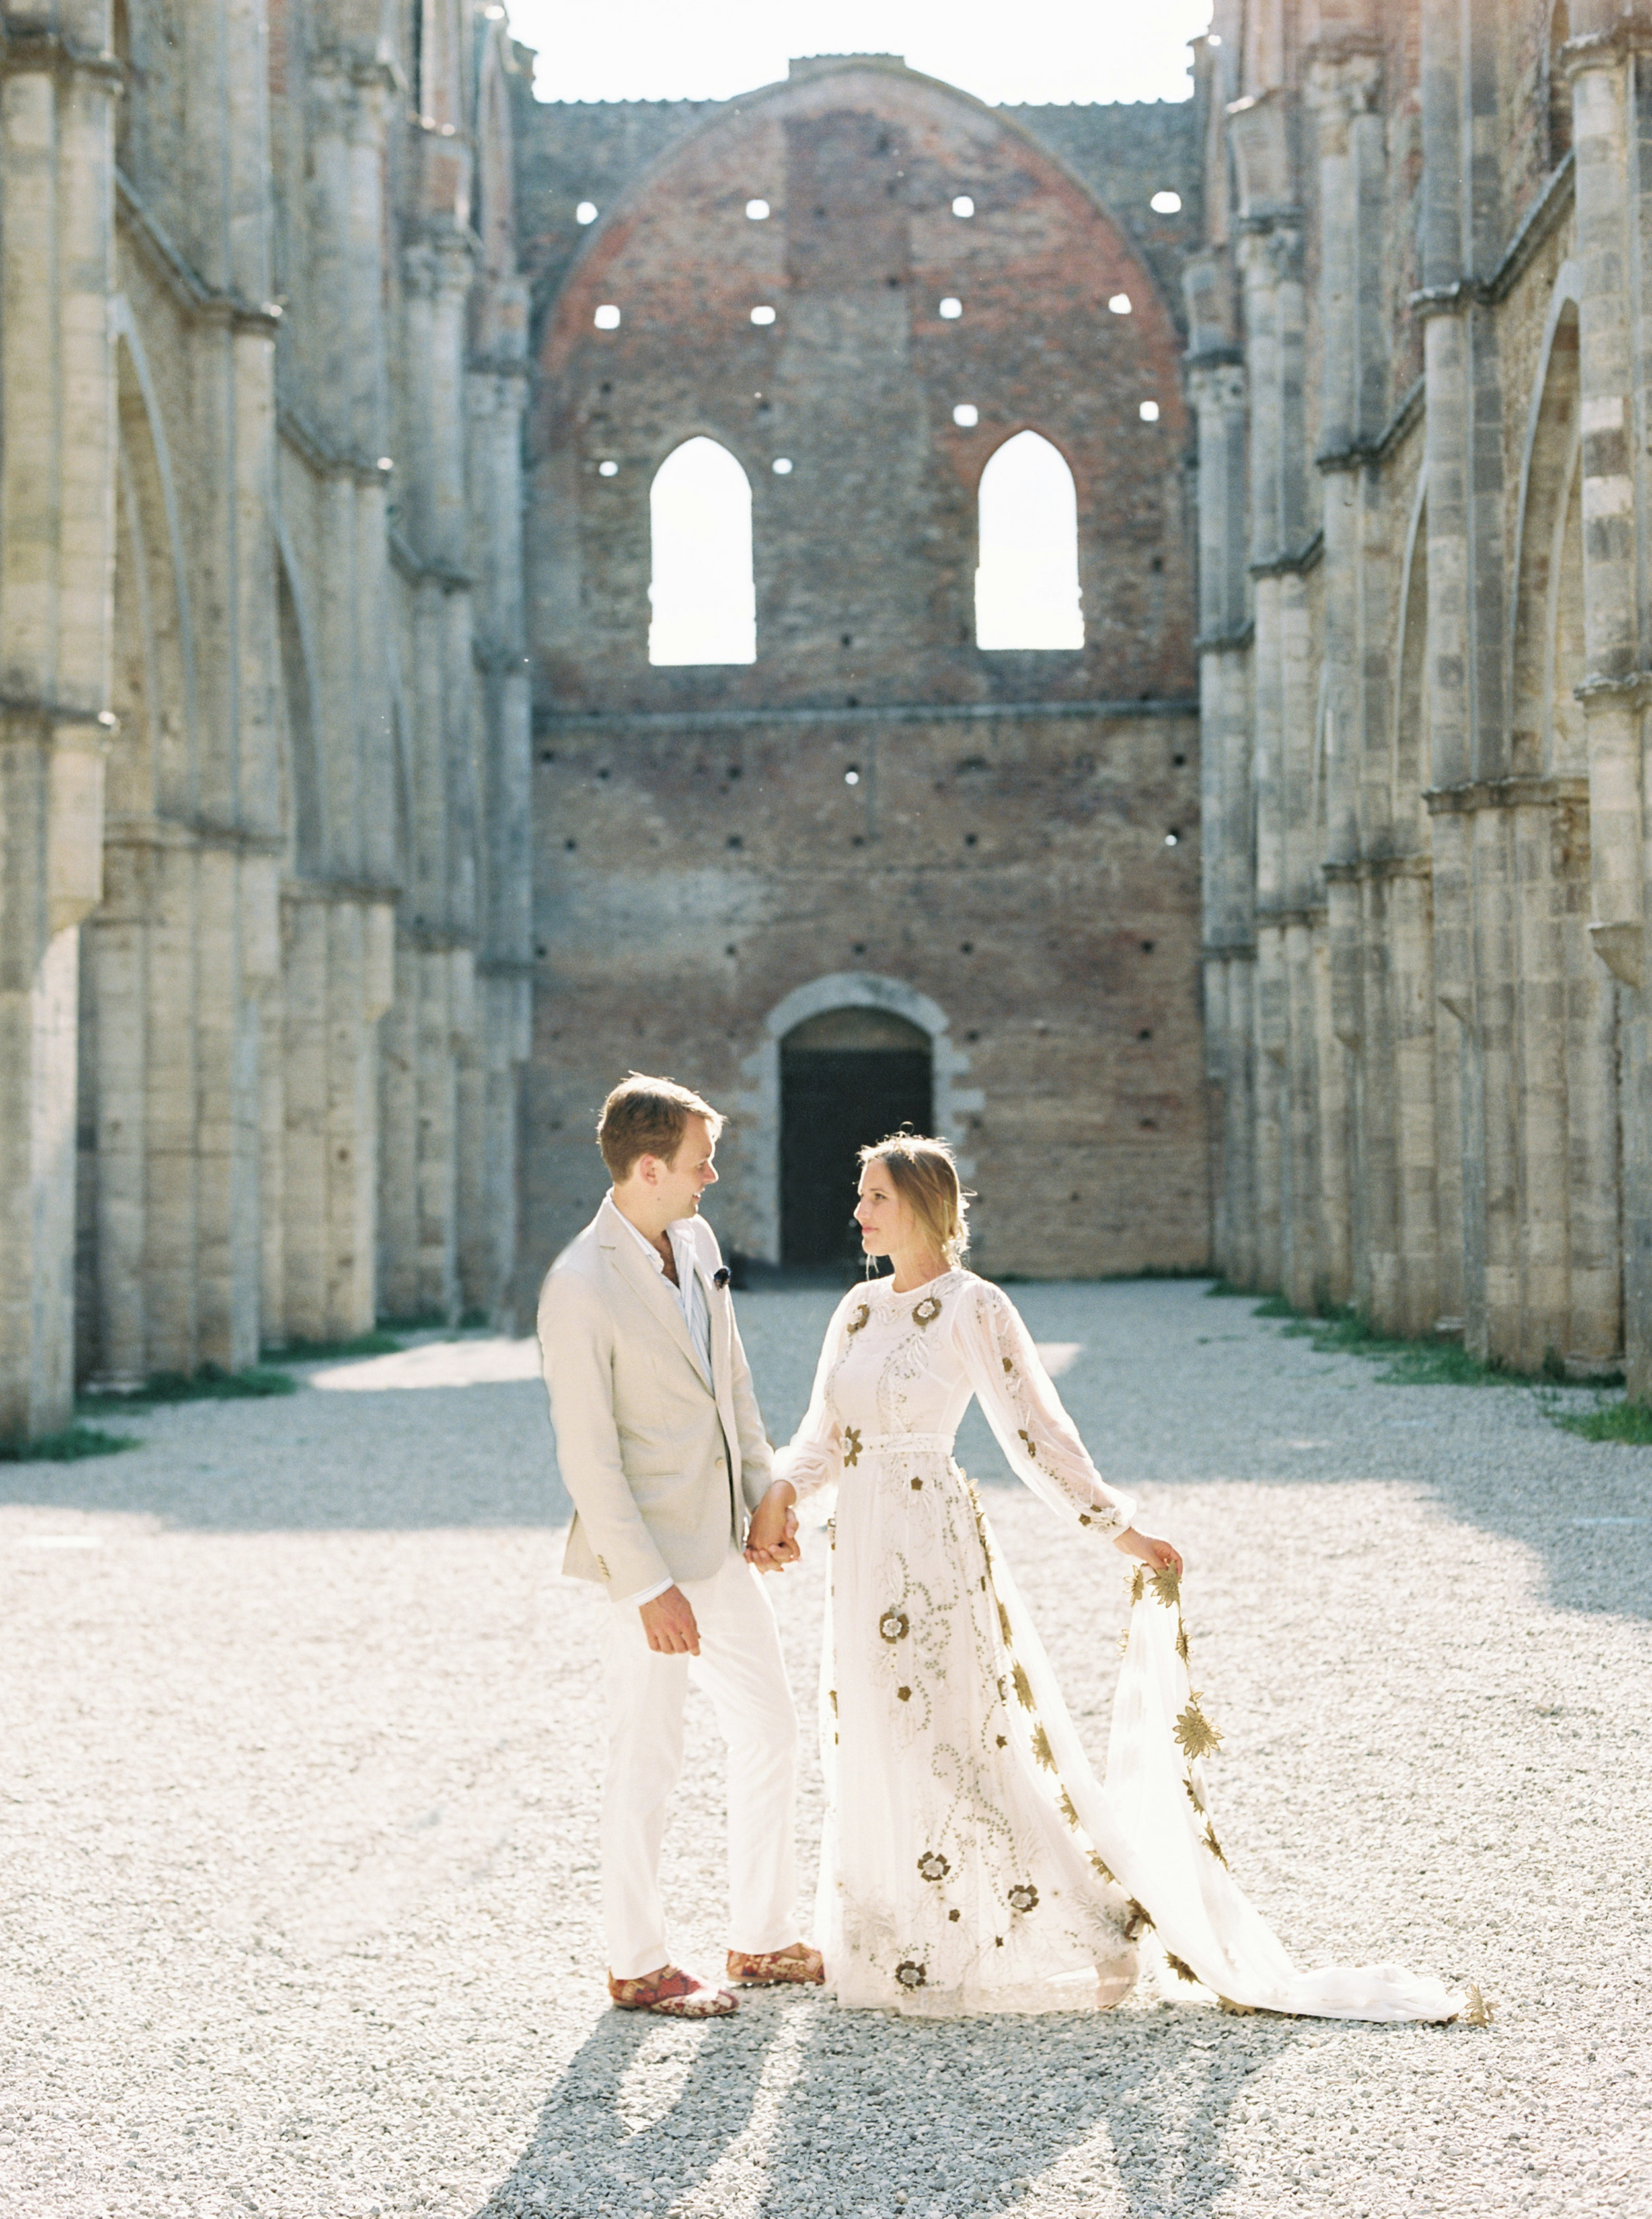 Kyle John l Fine Art Wedding Photography l Chicago, Copenhagen, California, New York, Destination l Blog l Alexis and Zach_Borgo Santo Pietro_Italy_Tuscany_52